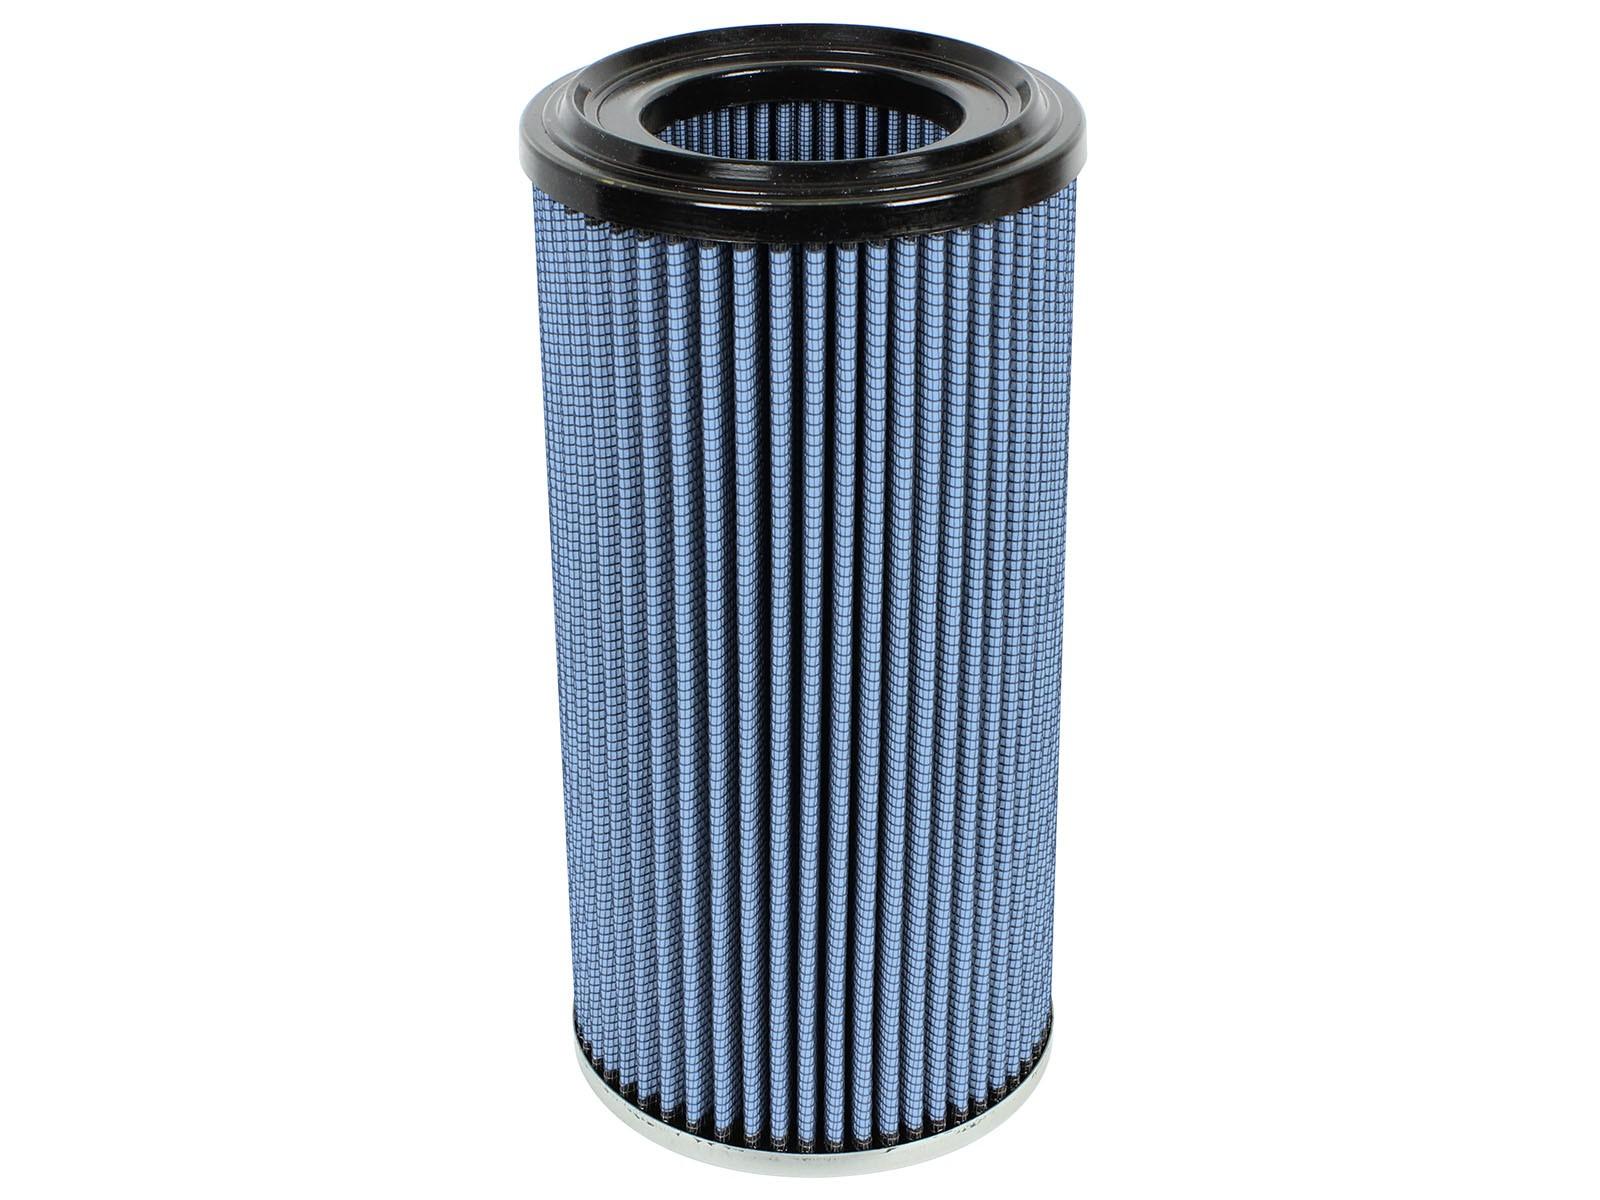 aFe POWER 10-90005 Magnum FLOW Pro 5R Air Filter